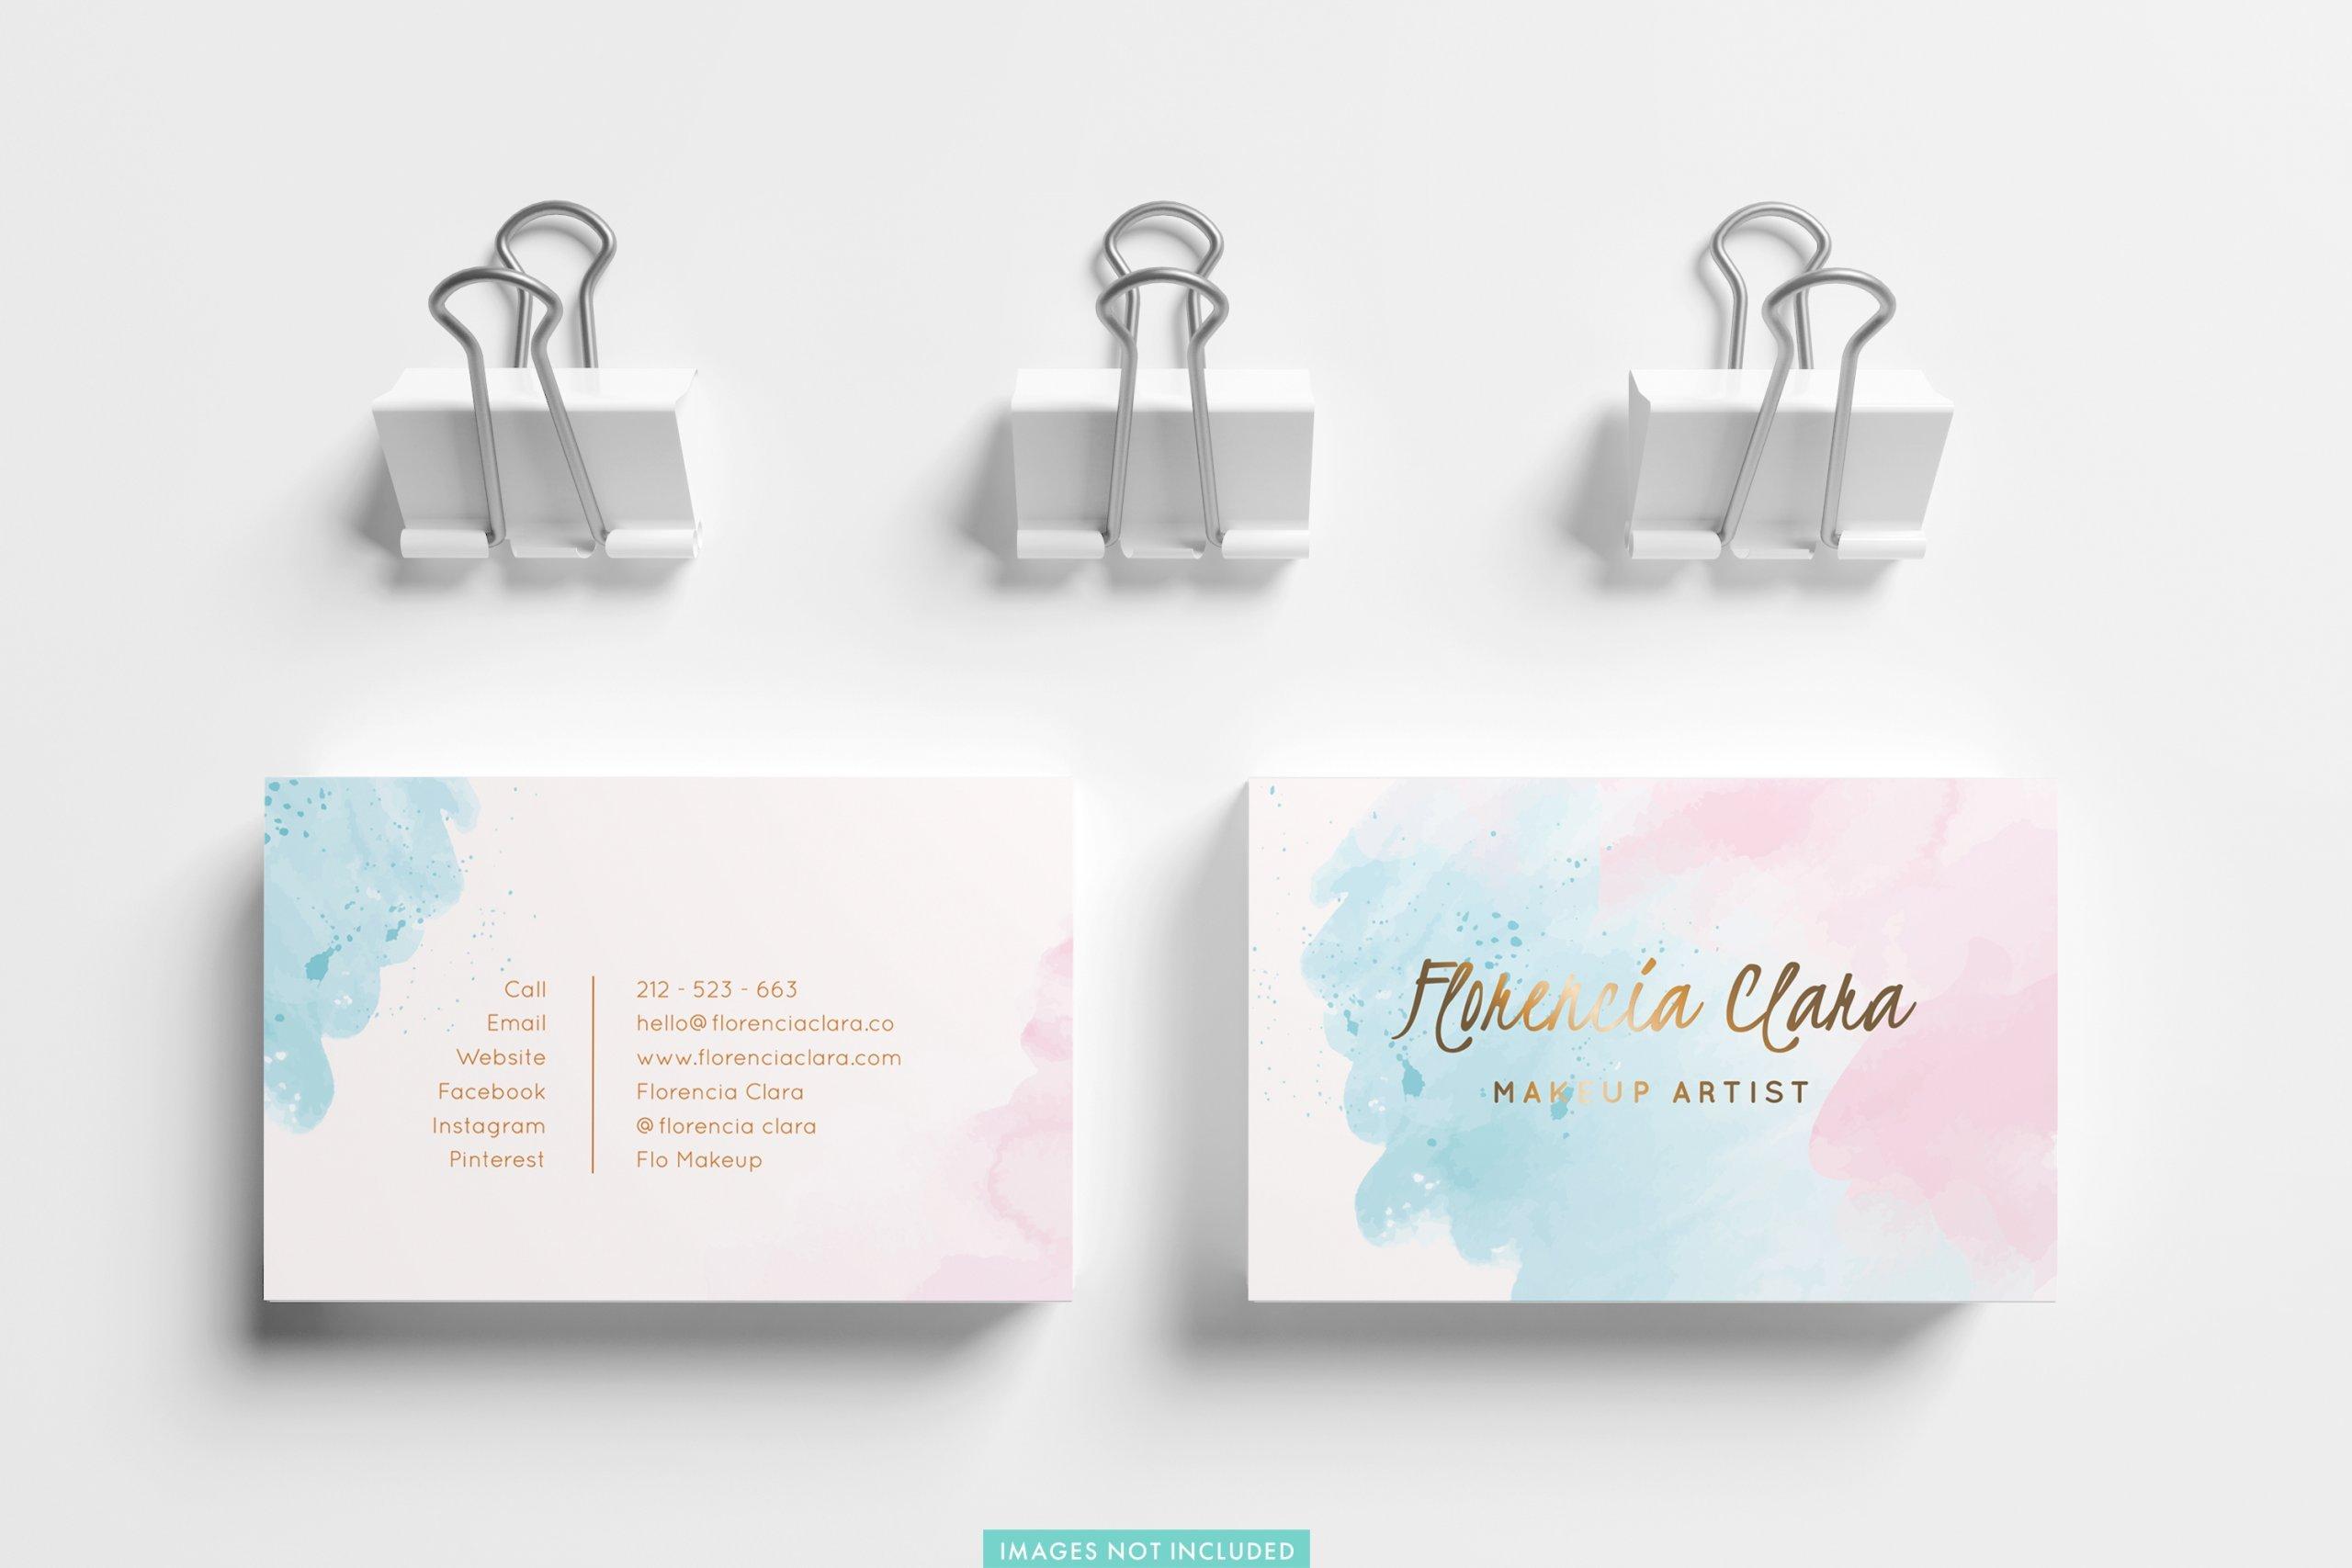 printingnews-A029-03 paperbox好文分享-霧面與亮面之間的區別